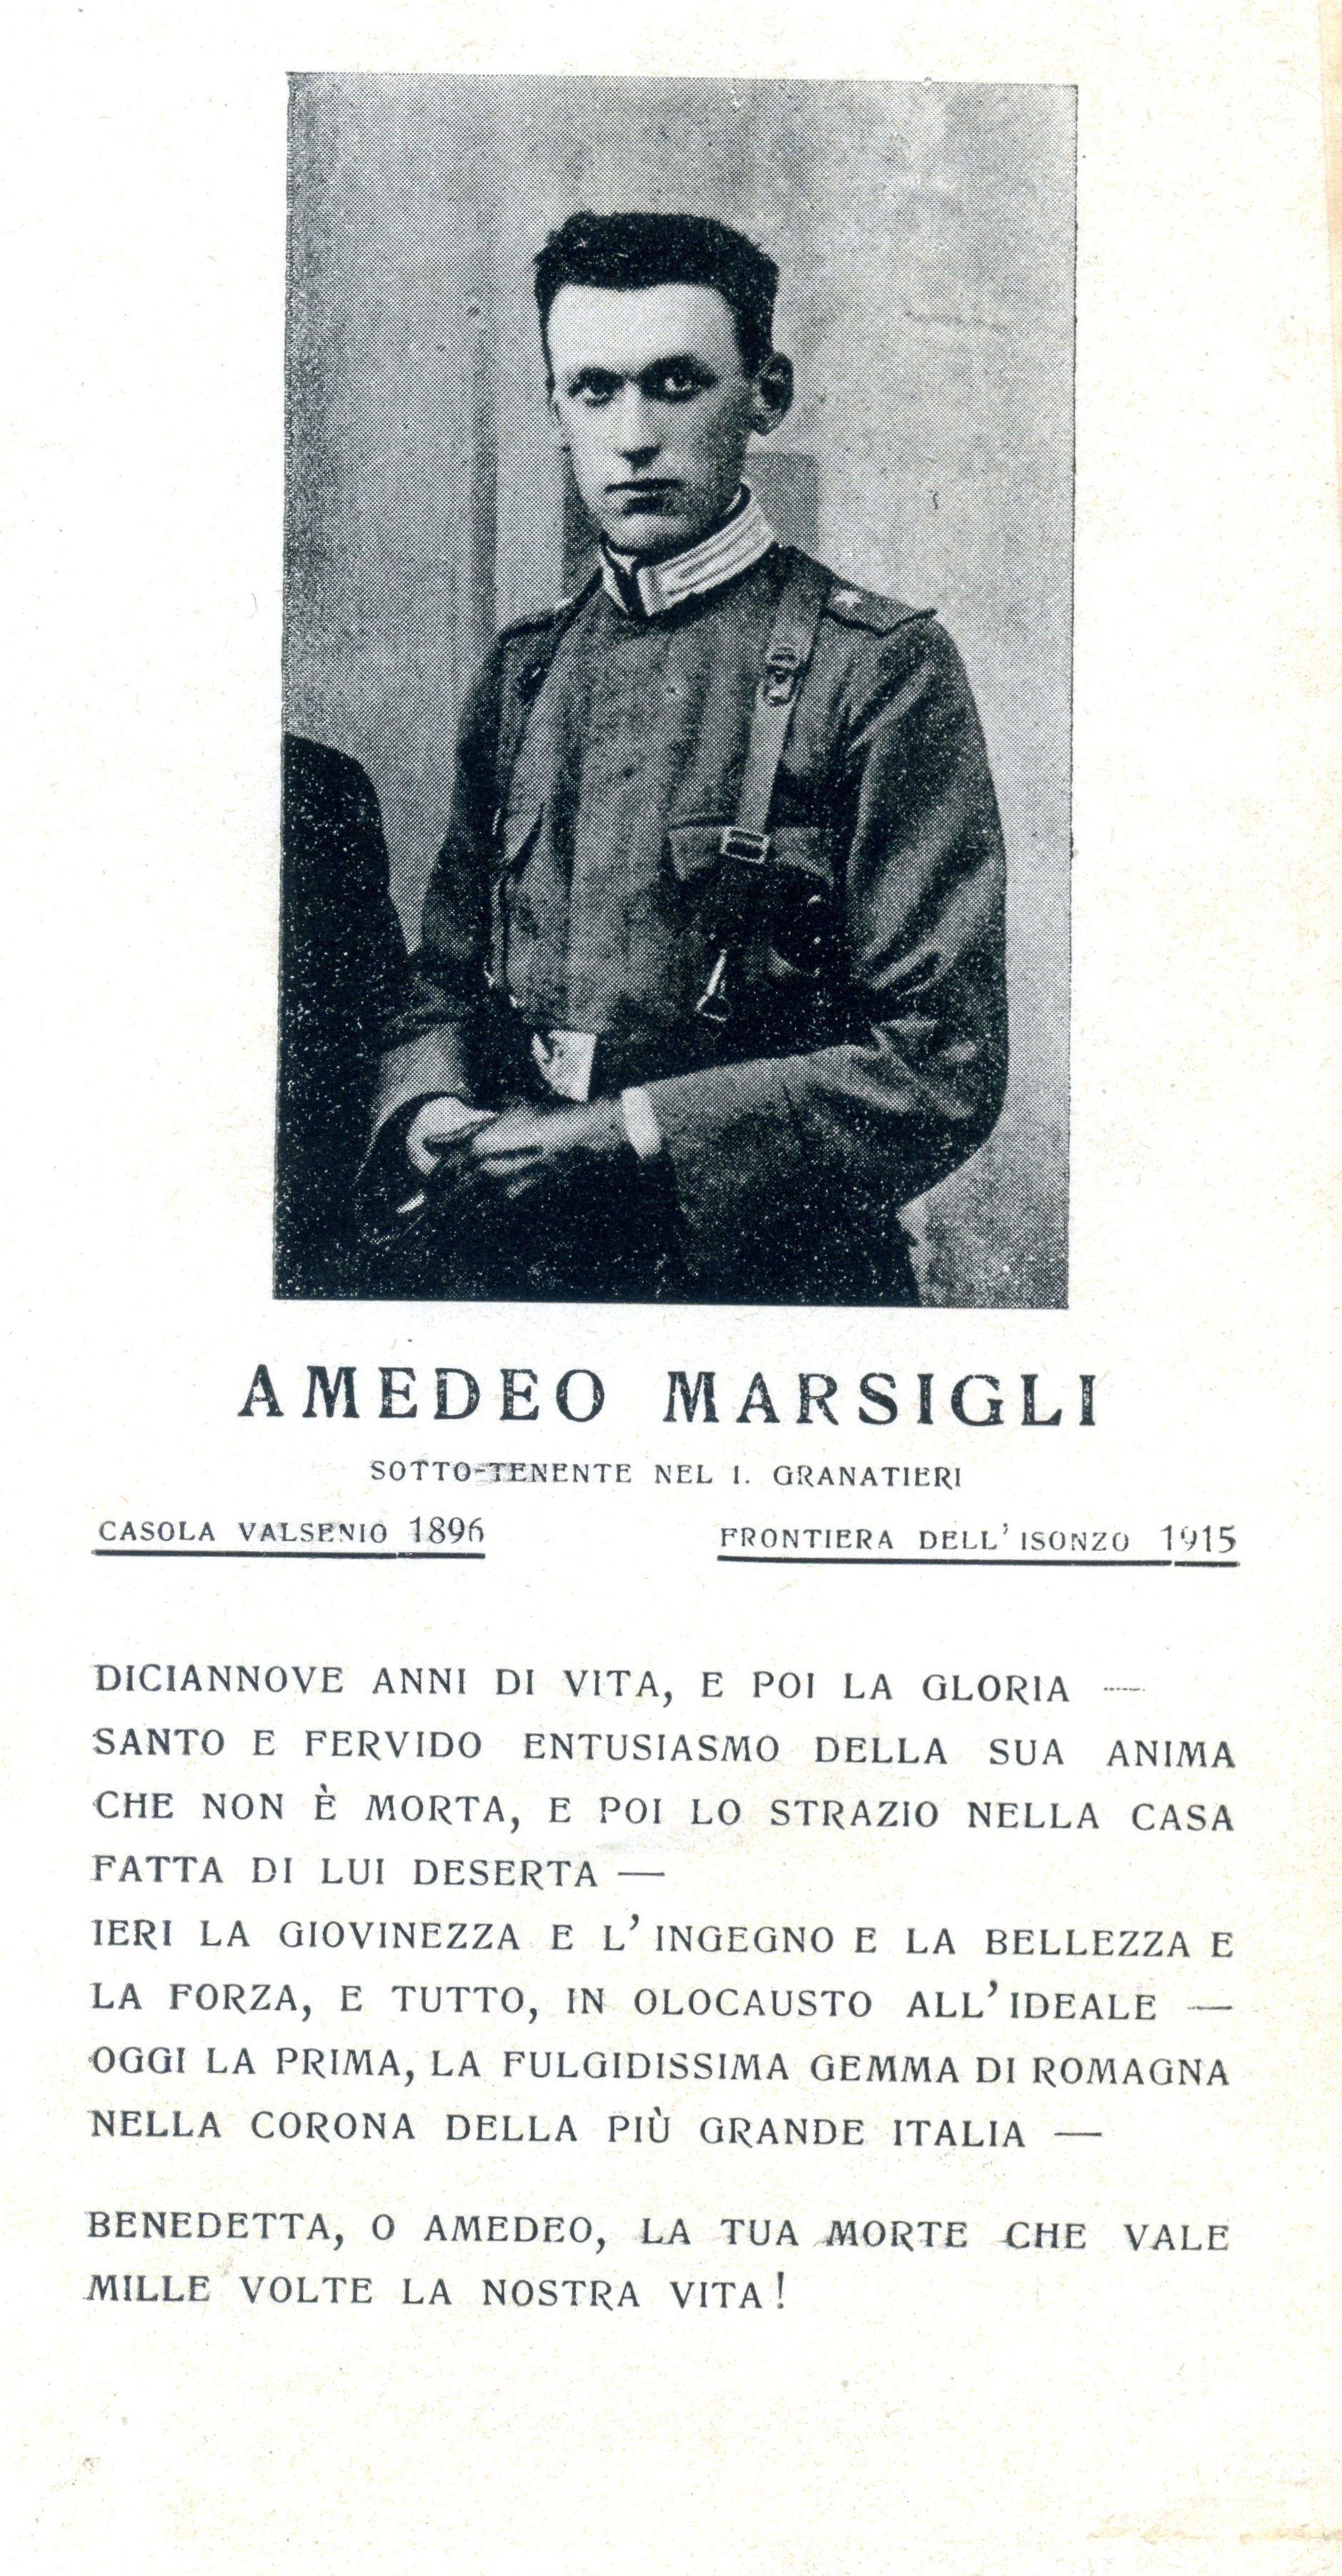 Marsigli